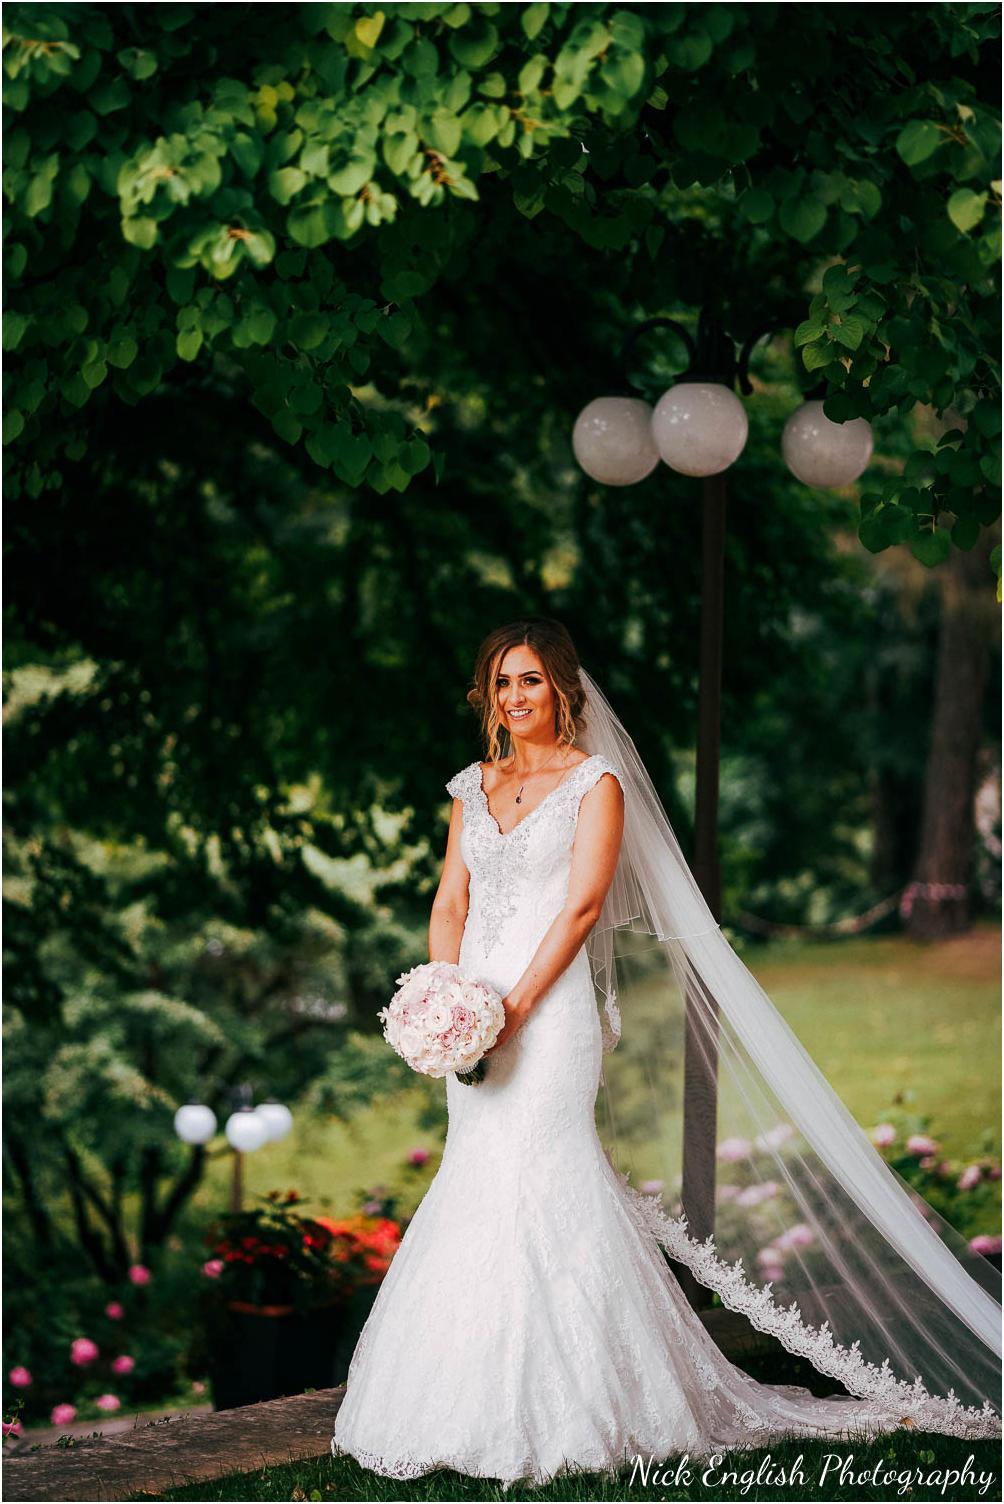 Destination_Wedding_Photographer_Slovenia_Nick_English_Photography-71.jpg